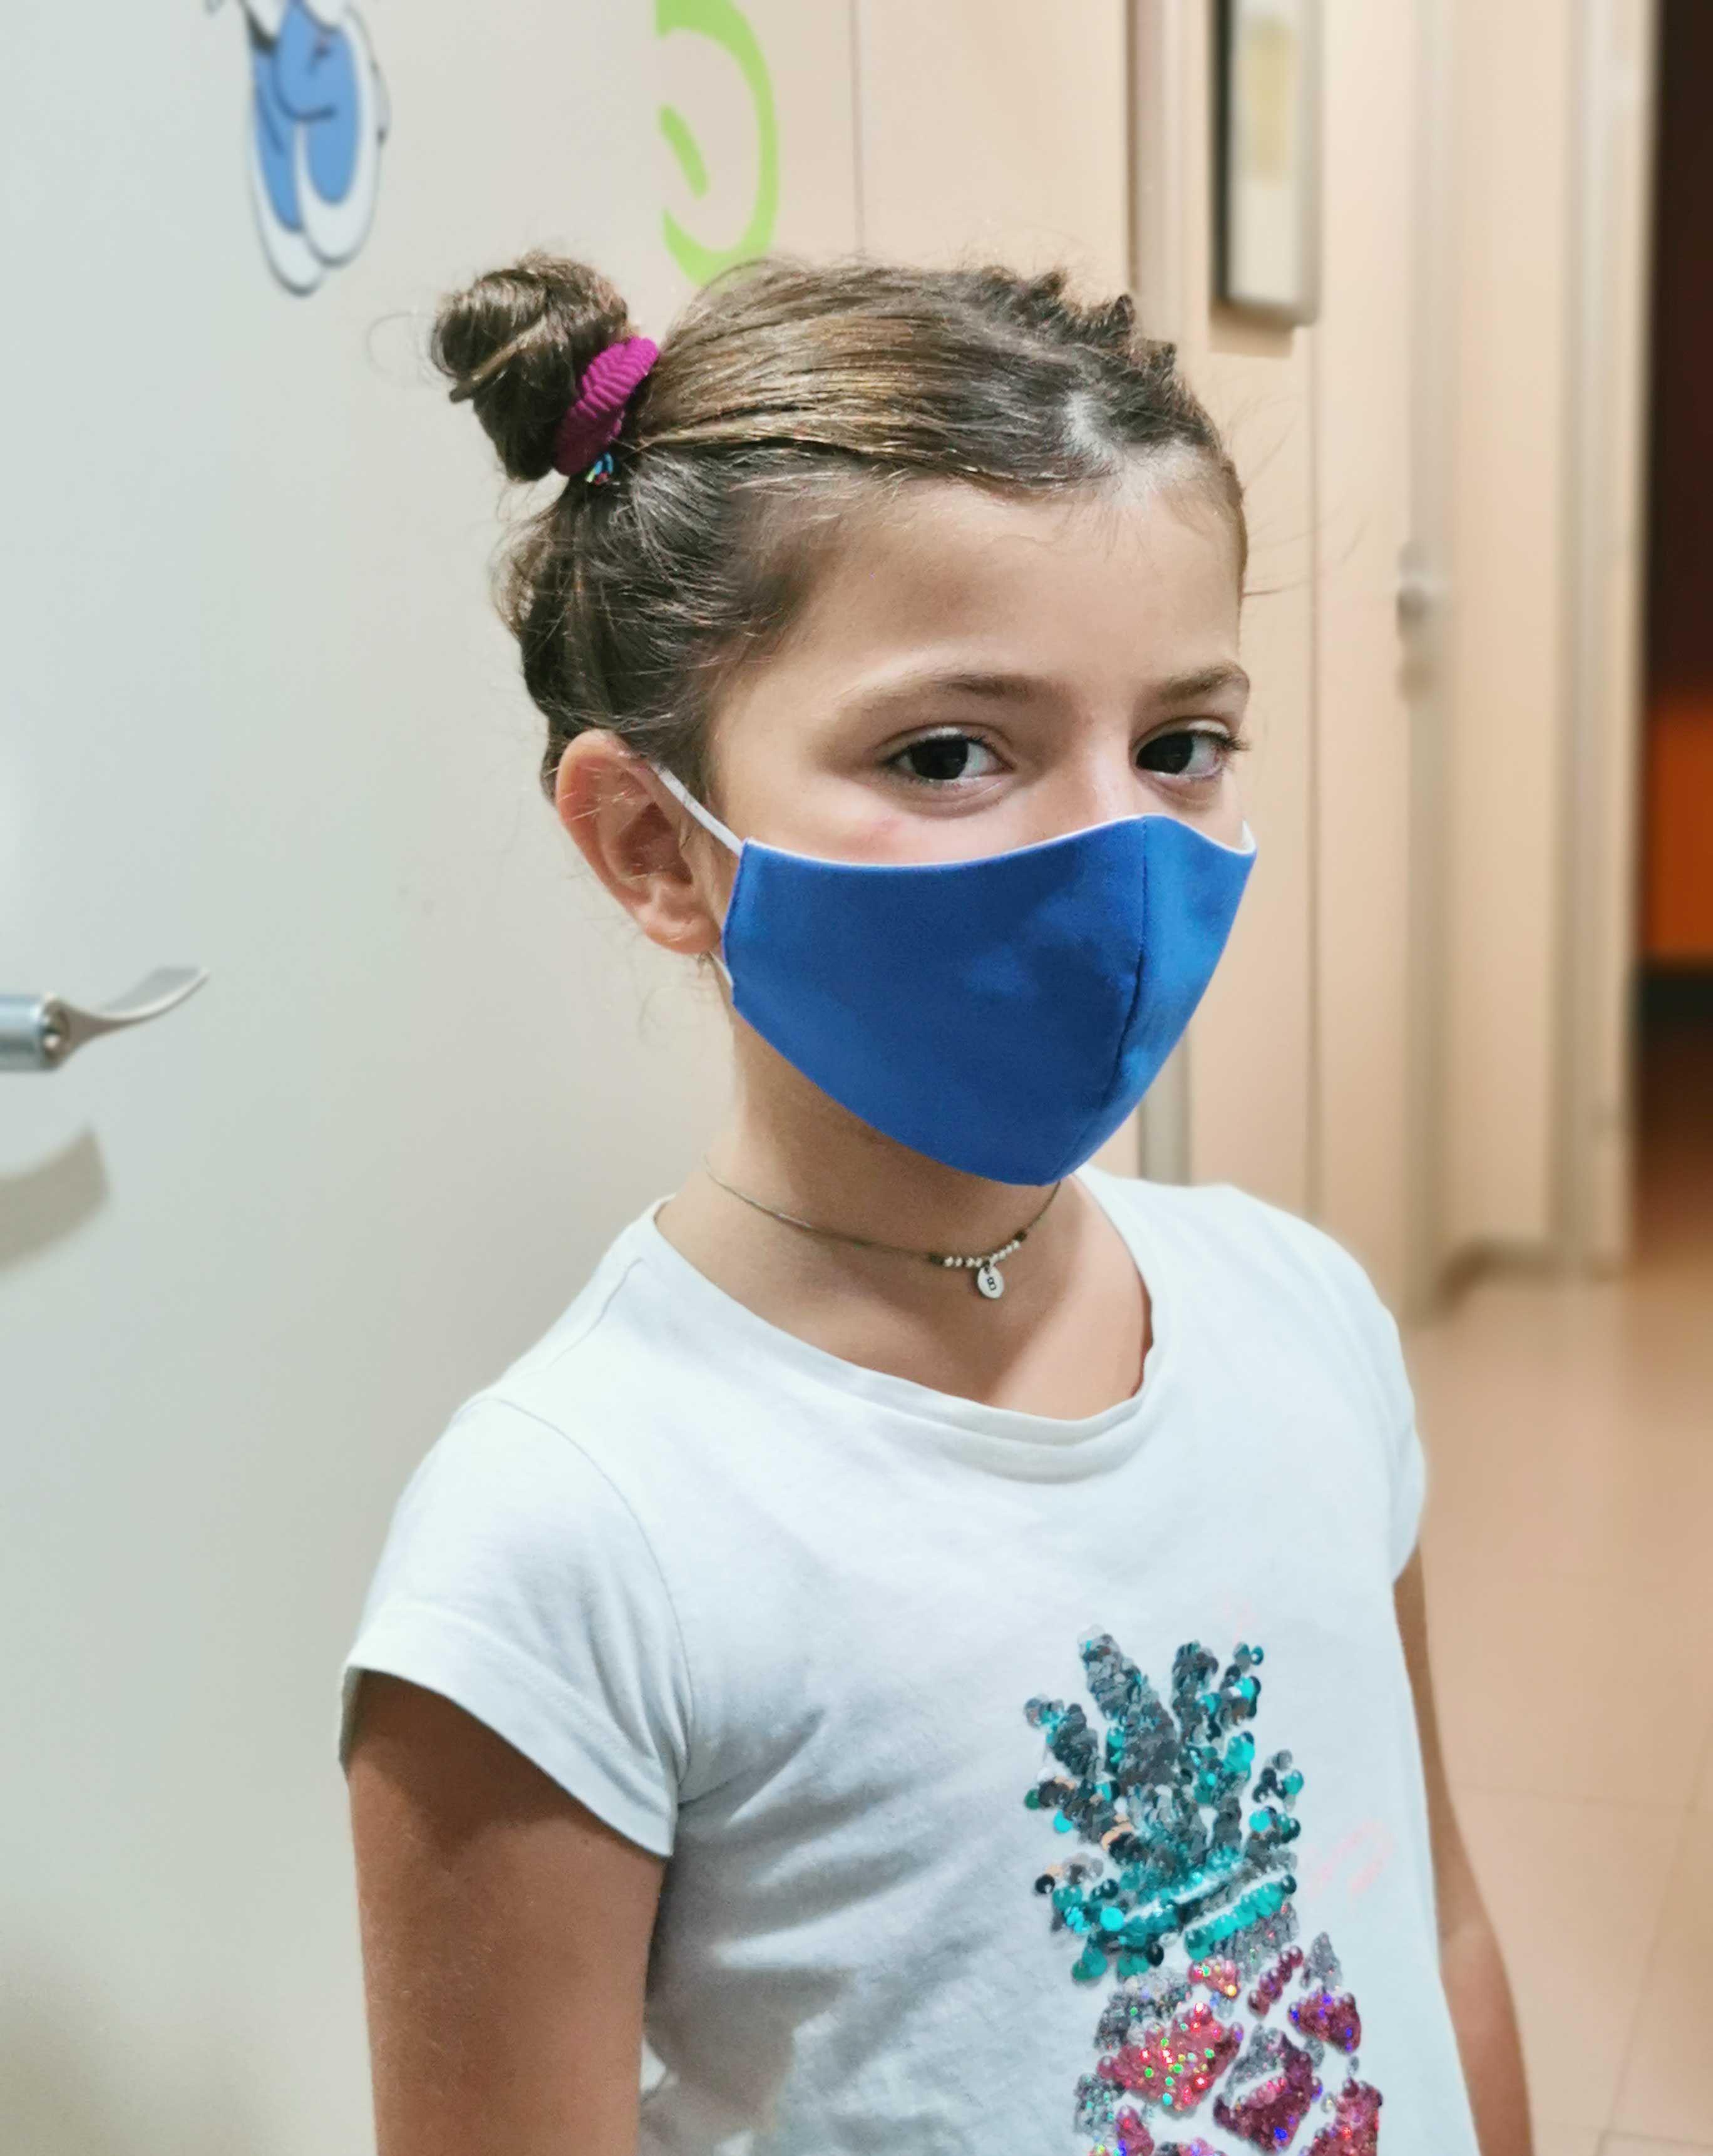 Fotografia Mascarillas sanitarias infantiles Lavables con